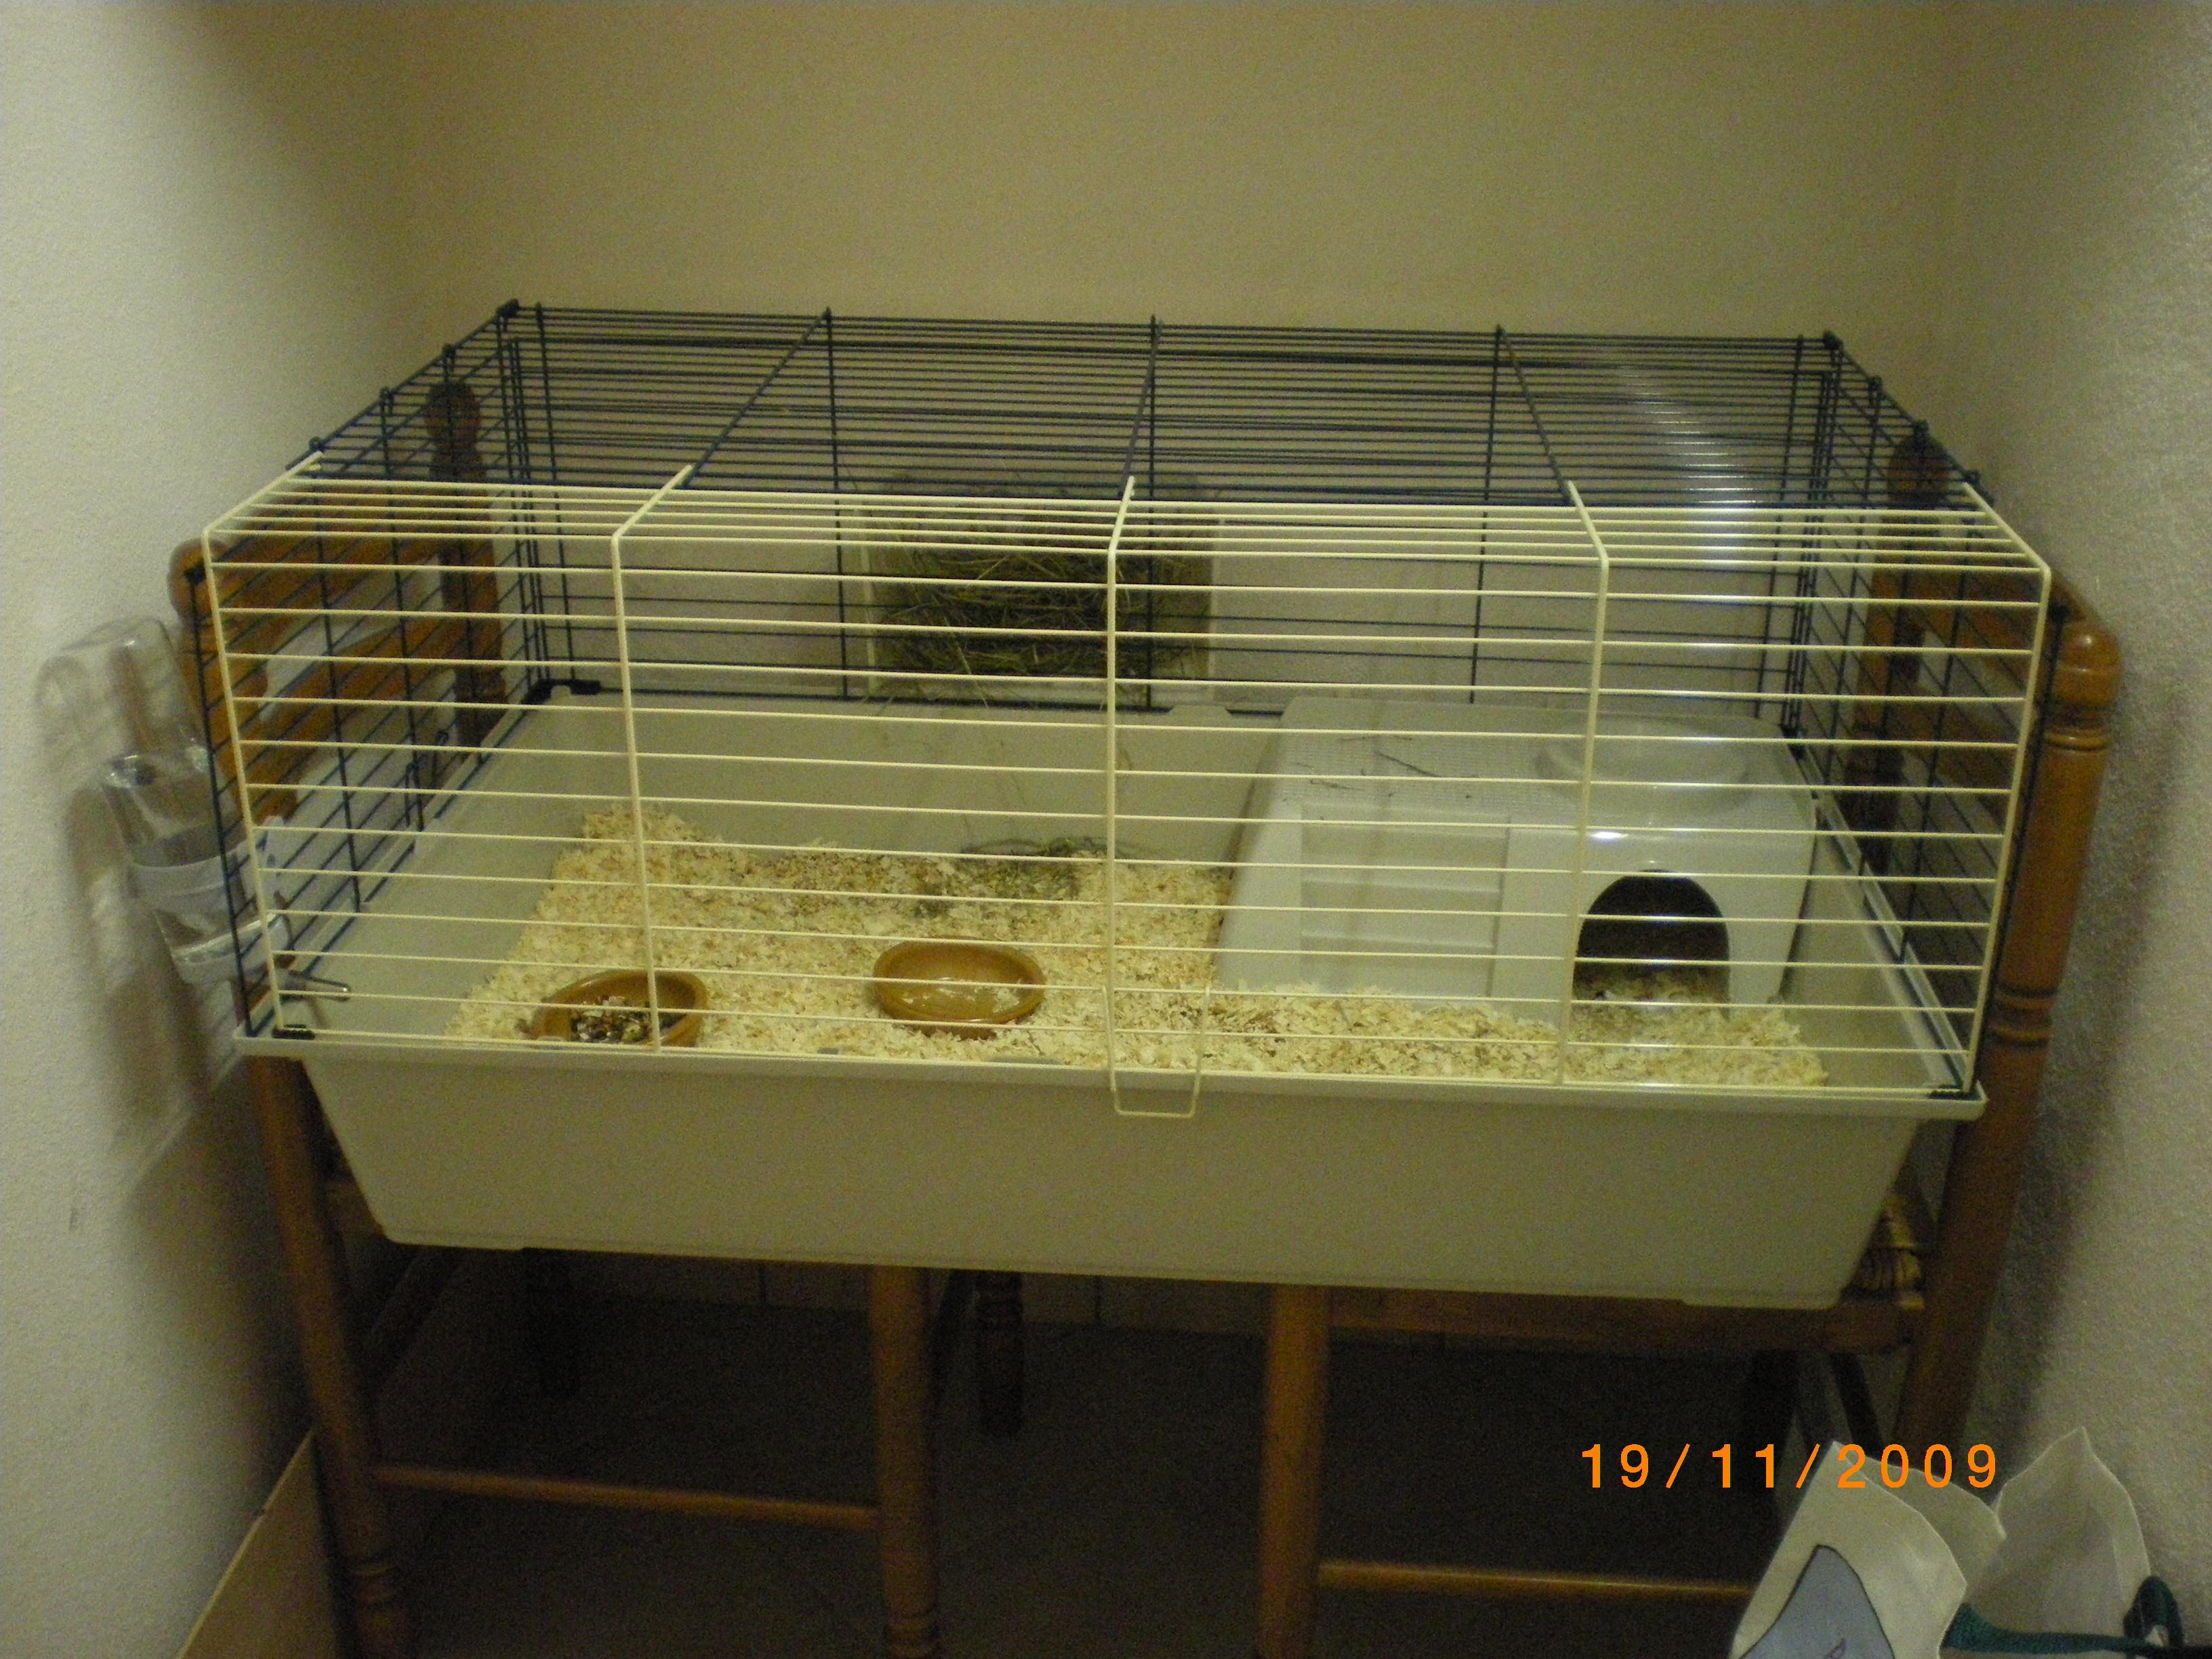 cage fifi mon cochon d inde fifi fifille2a photos. Black Bedroom Furniture Sets. Home Design Ideas